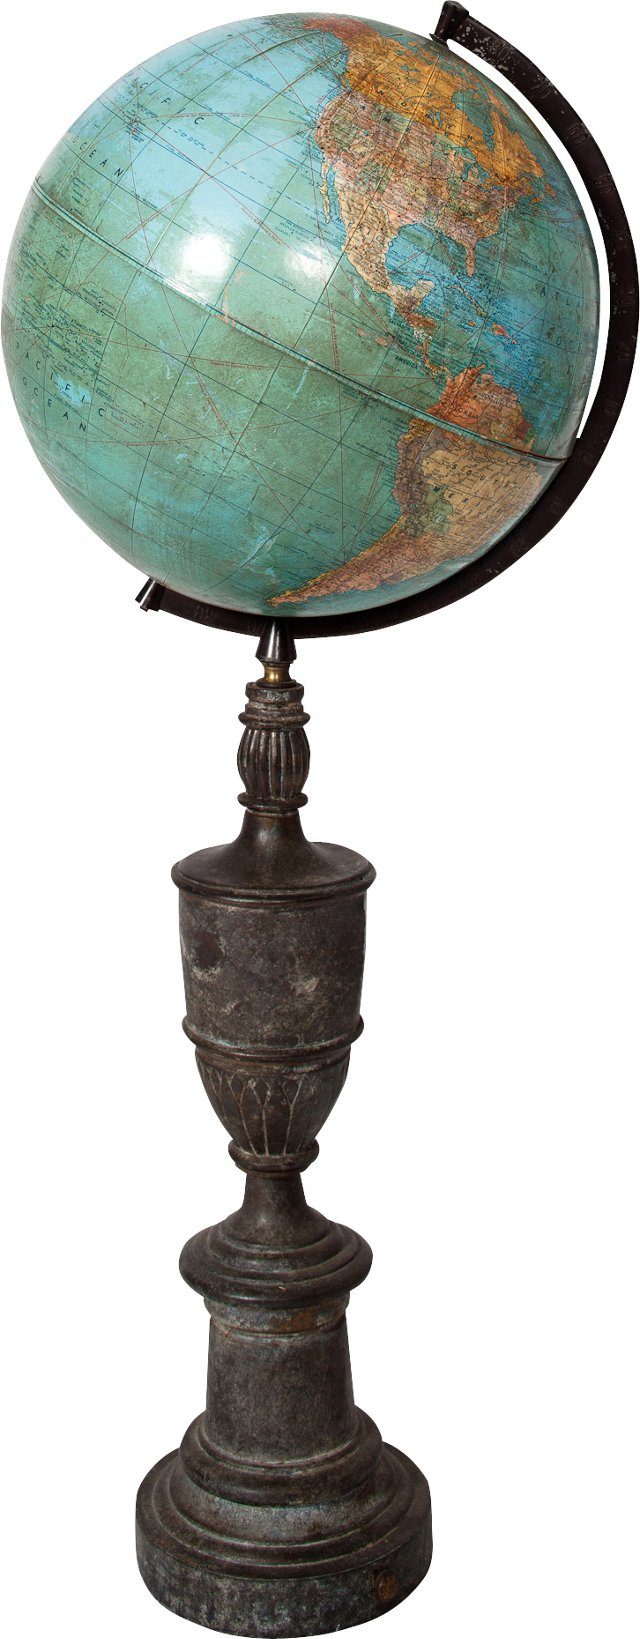 Tall Antique Globe on Bronze Base